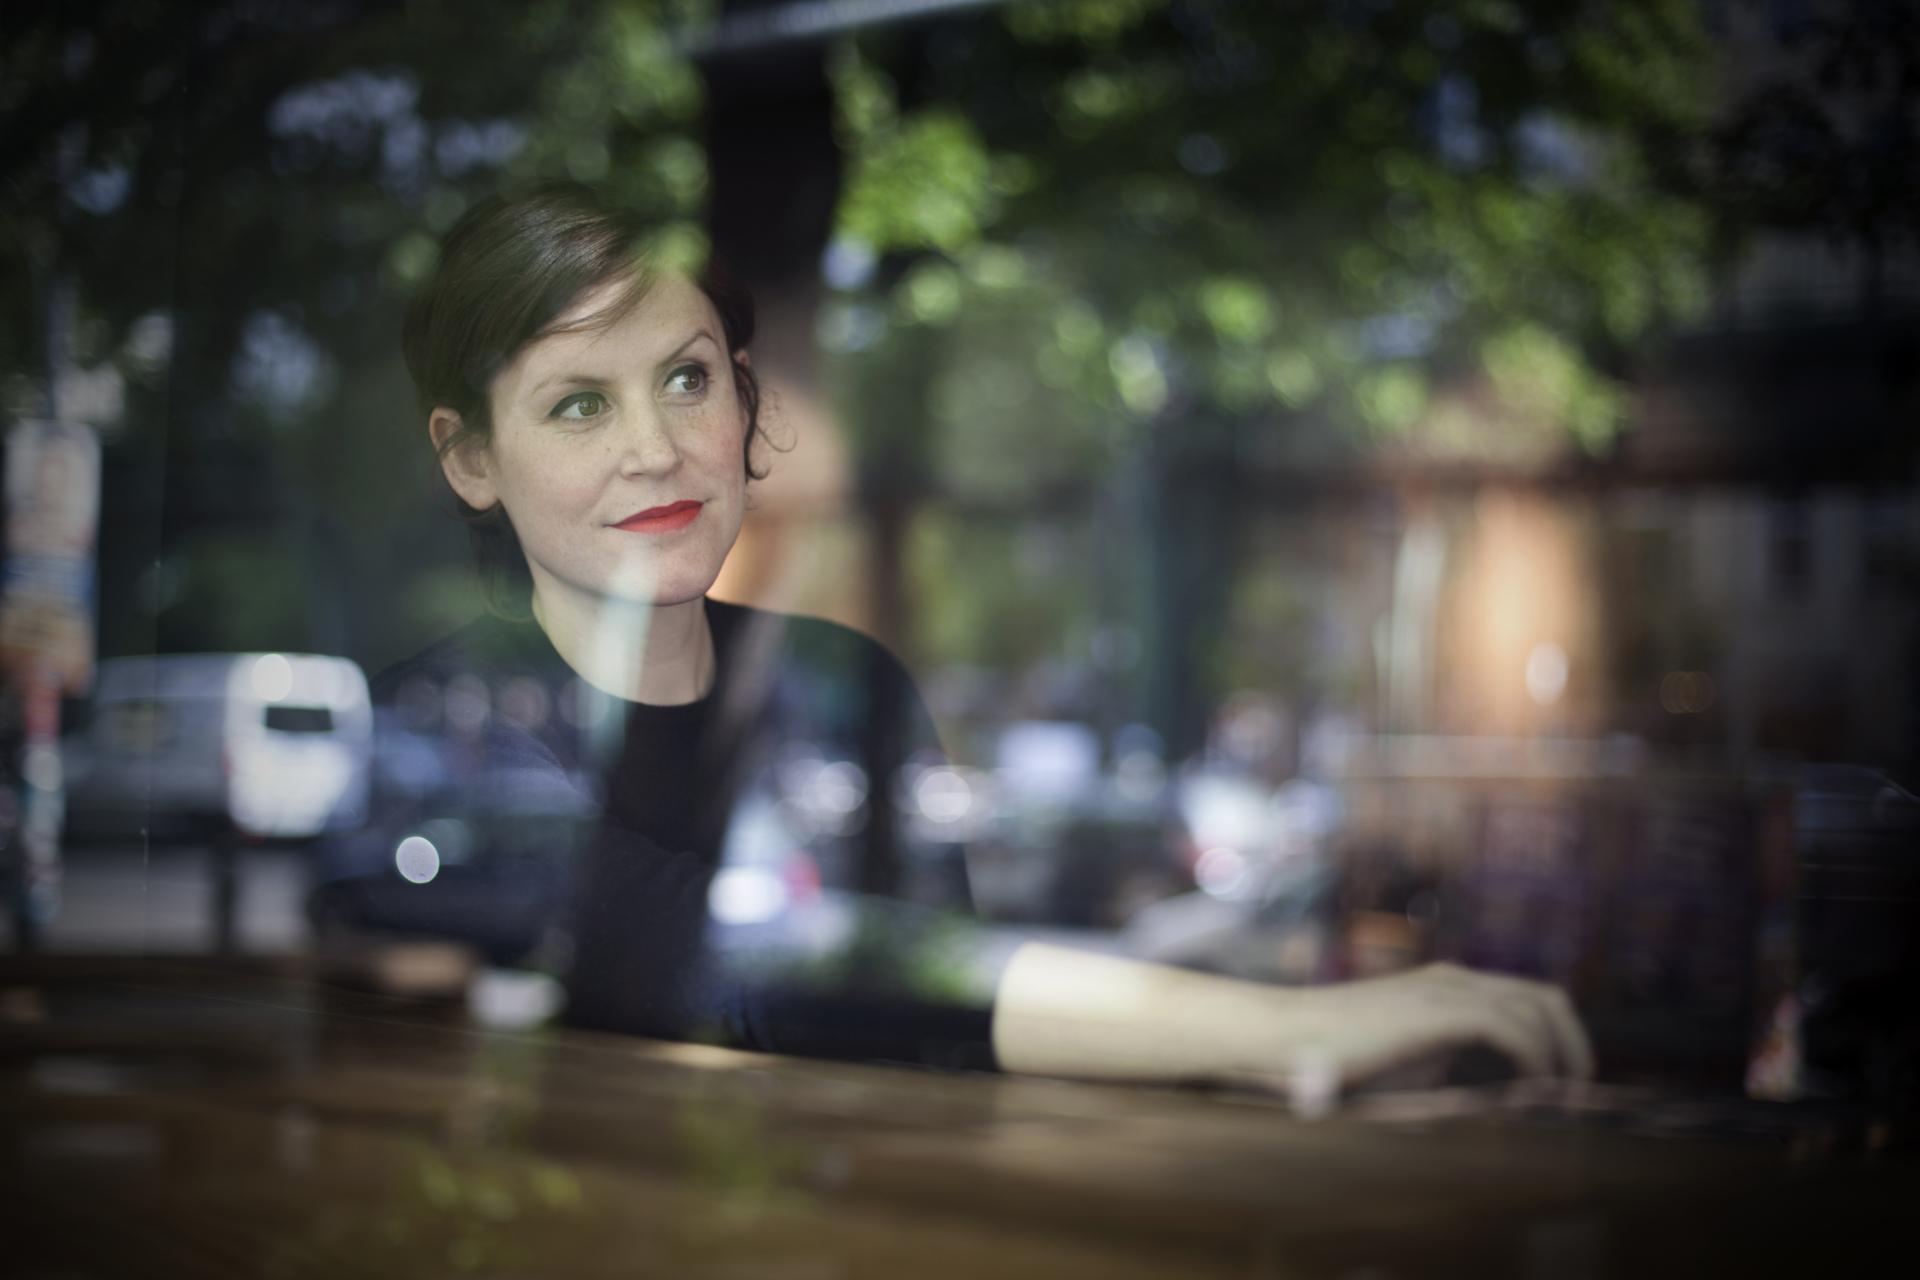 Katja Hentschel (founder/photographer)